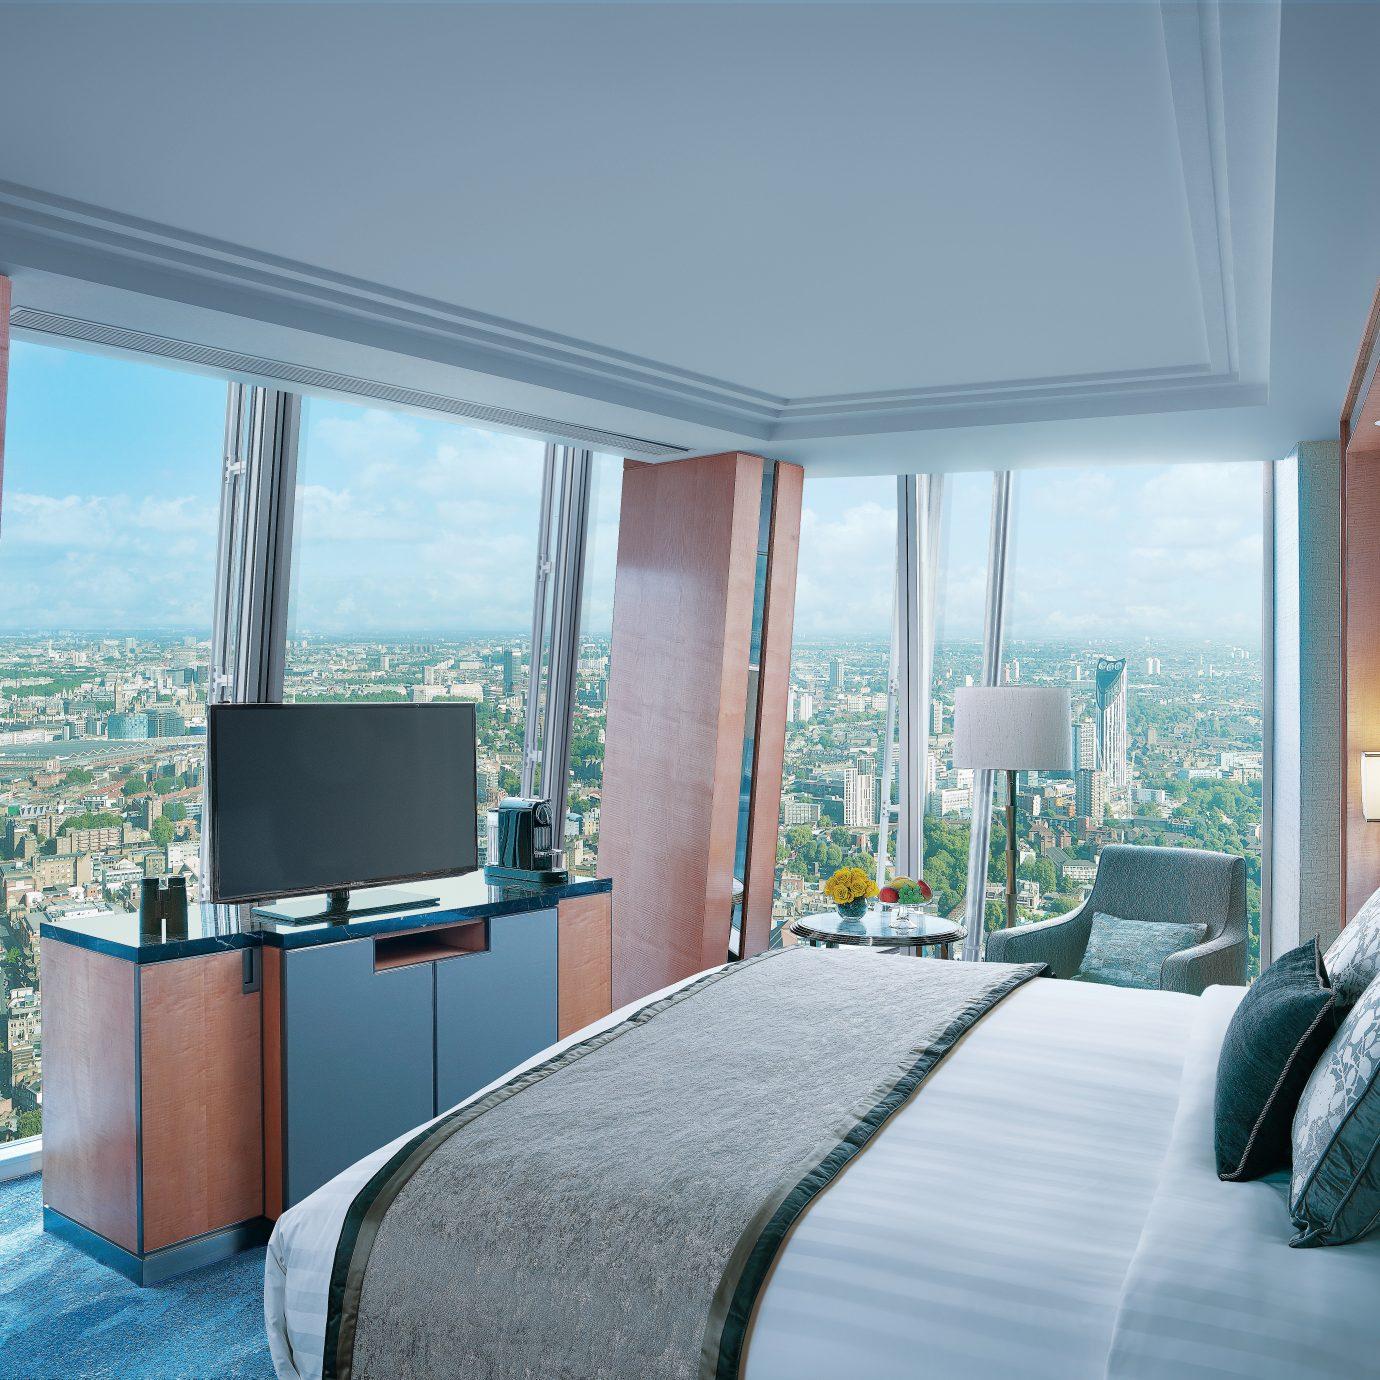 Bedroom Hotels Lounge Luxury Luxury Travel Modern Suite property house condominium living room home daylighting Villa overlooking